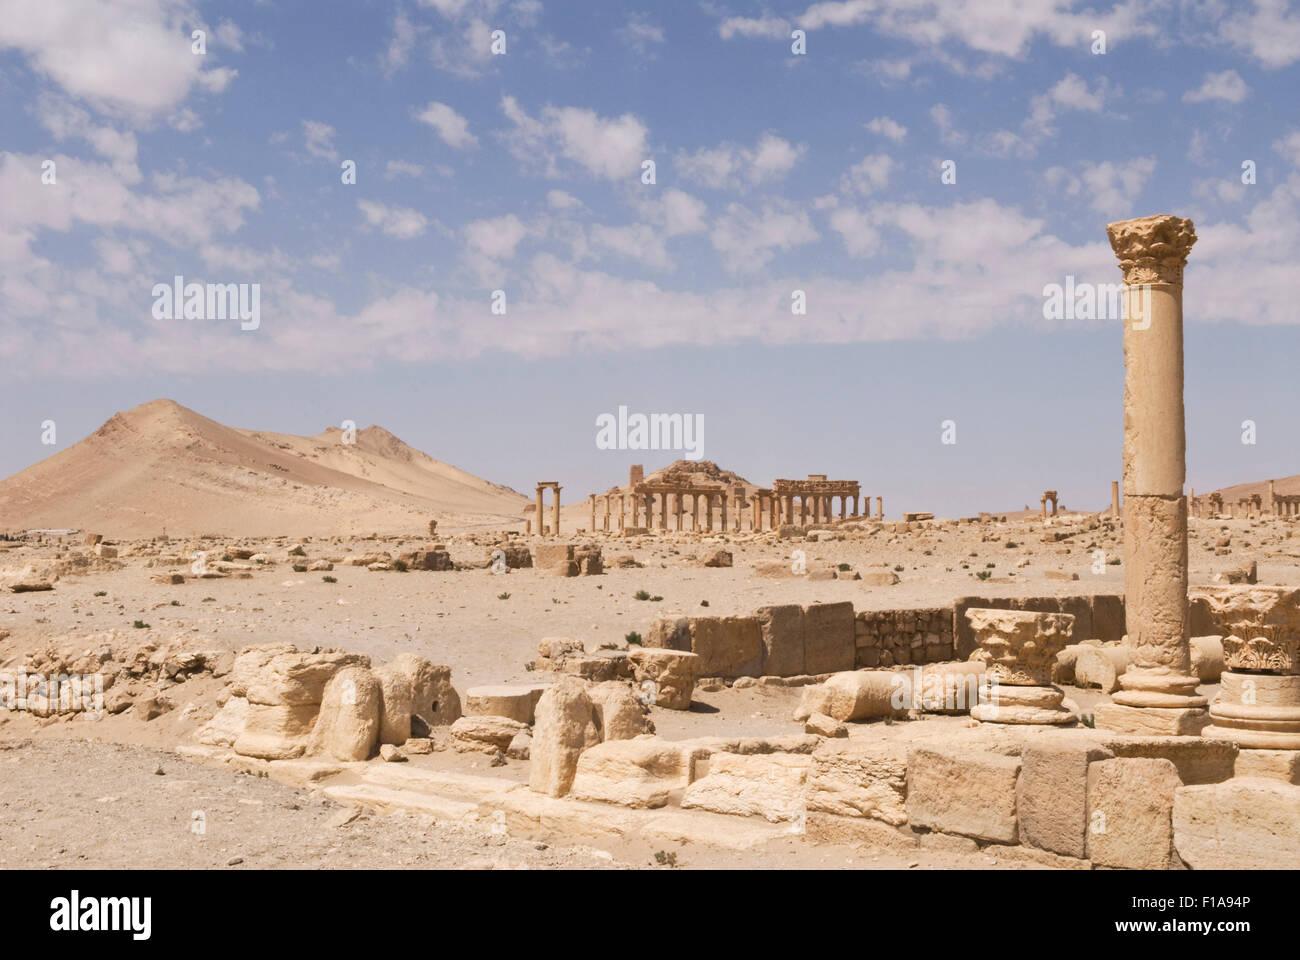 Palmyra, Syria - 2nd Century Roman ruins. UNESCO World Heritage Site. Mandatory credit Jo Whitworth - Stock Image